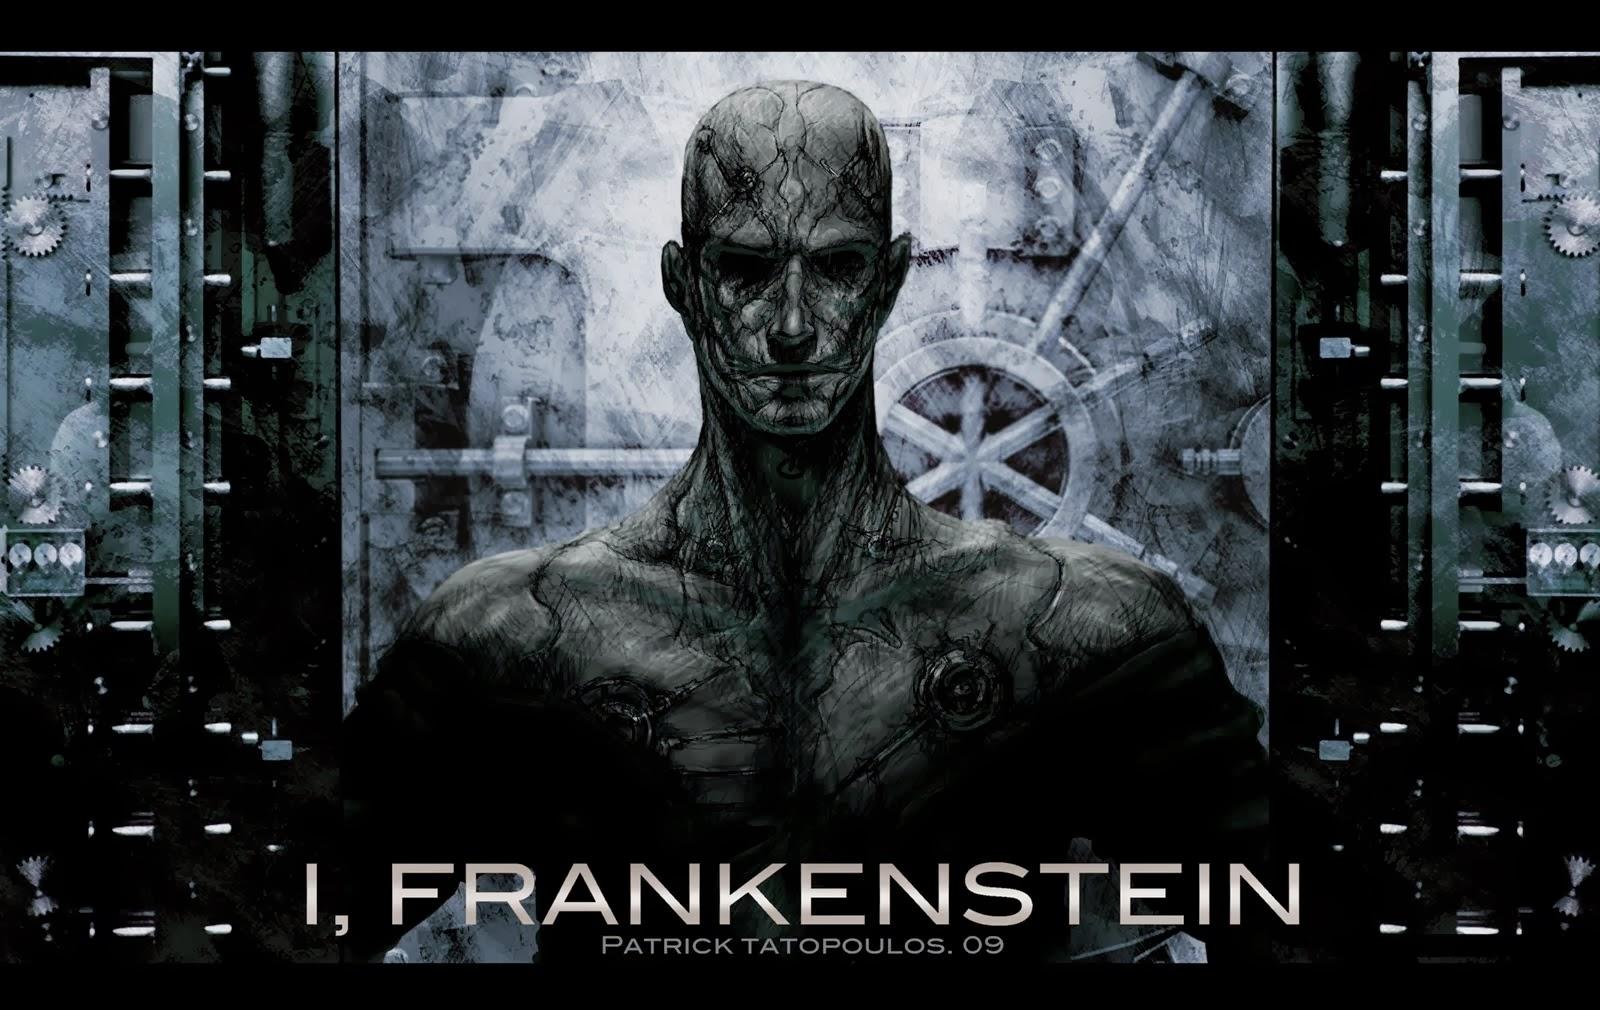 The Ace of Geeks: I, Frankenstein trailer brings thrills ...